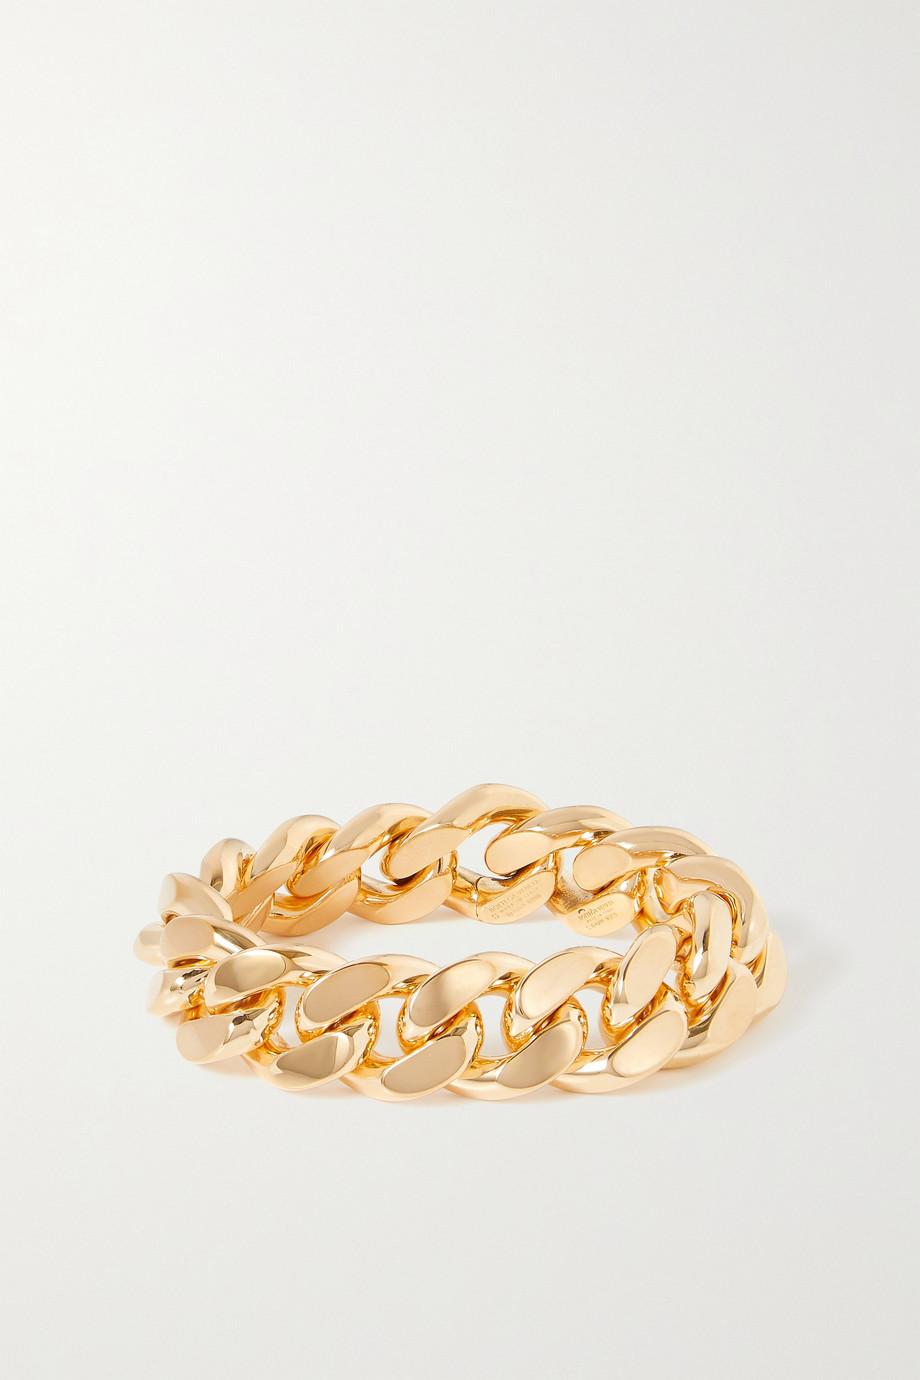 Bottega Veneta Armband aus vergoldetem Silber